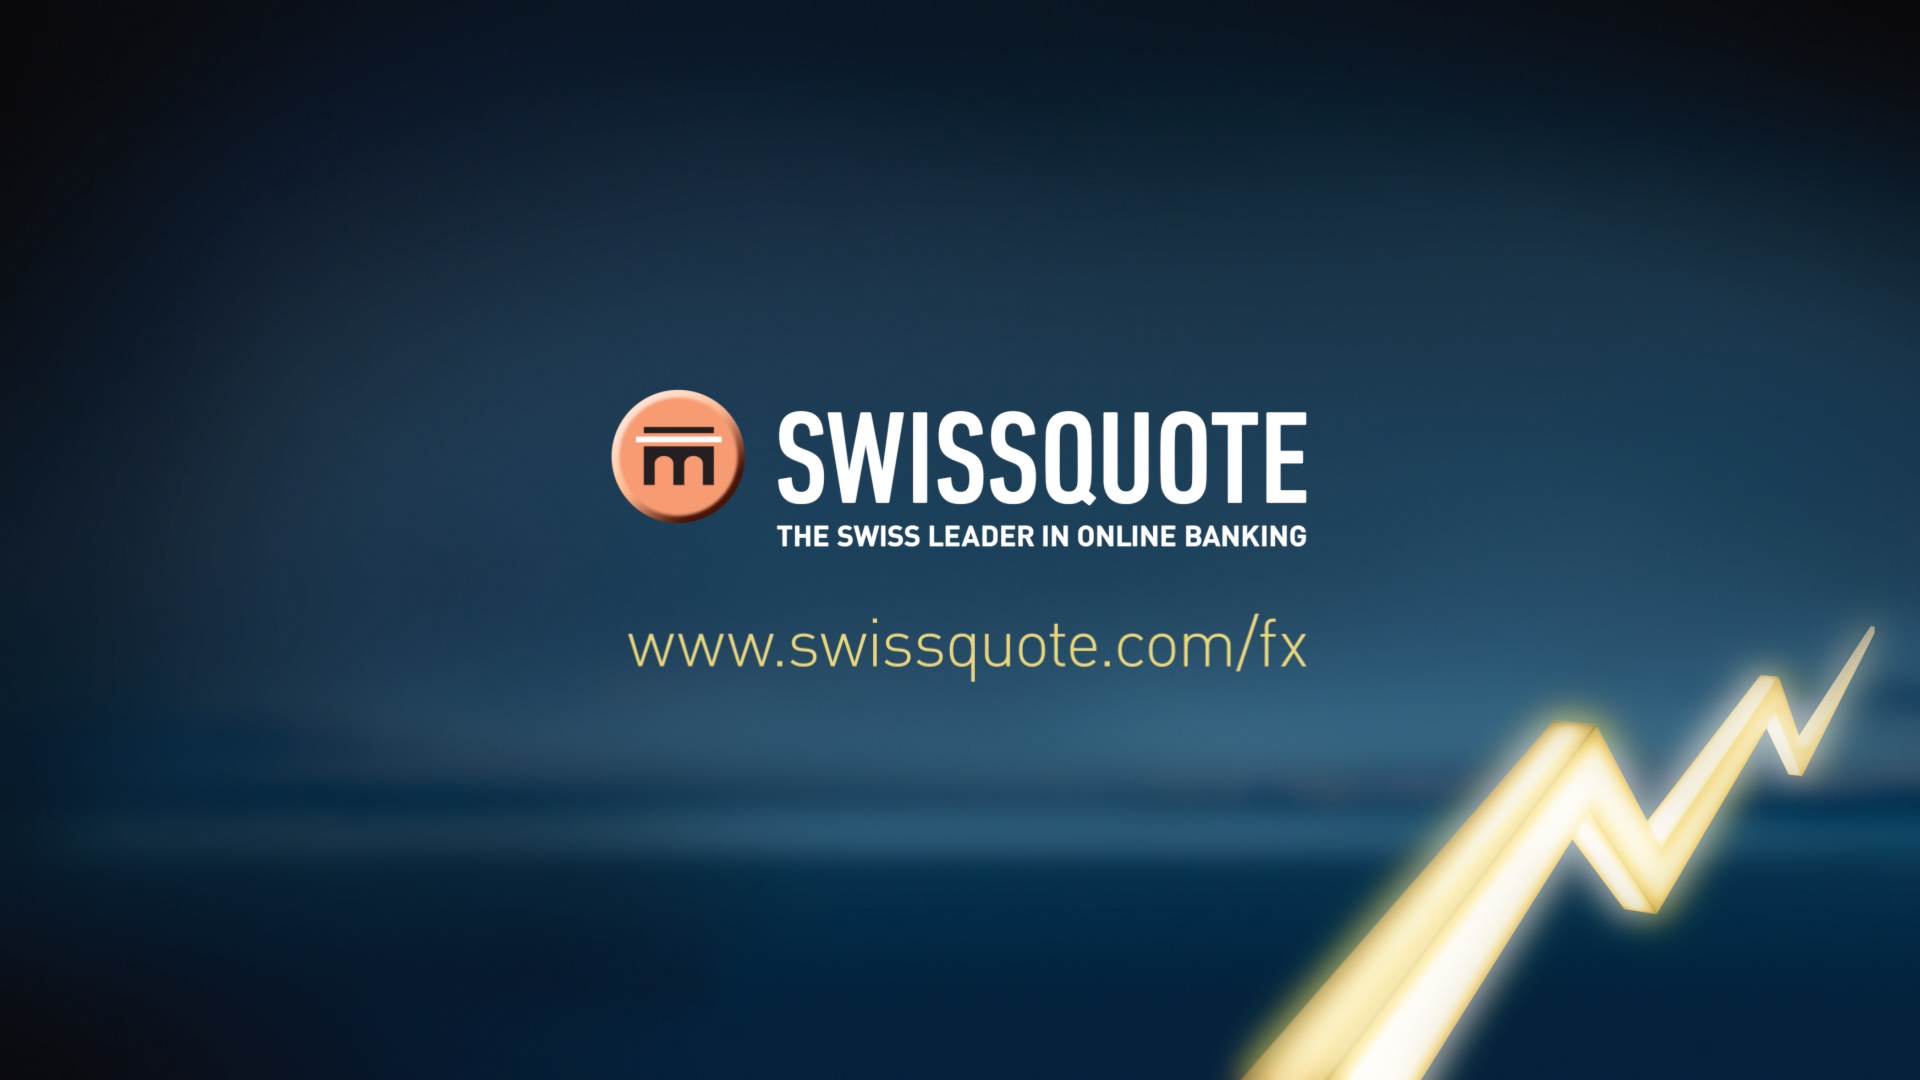 swissquote-Advanced-Trader-12-web.jpg